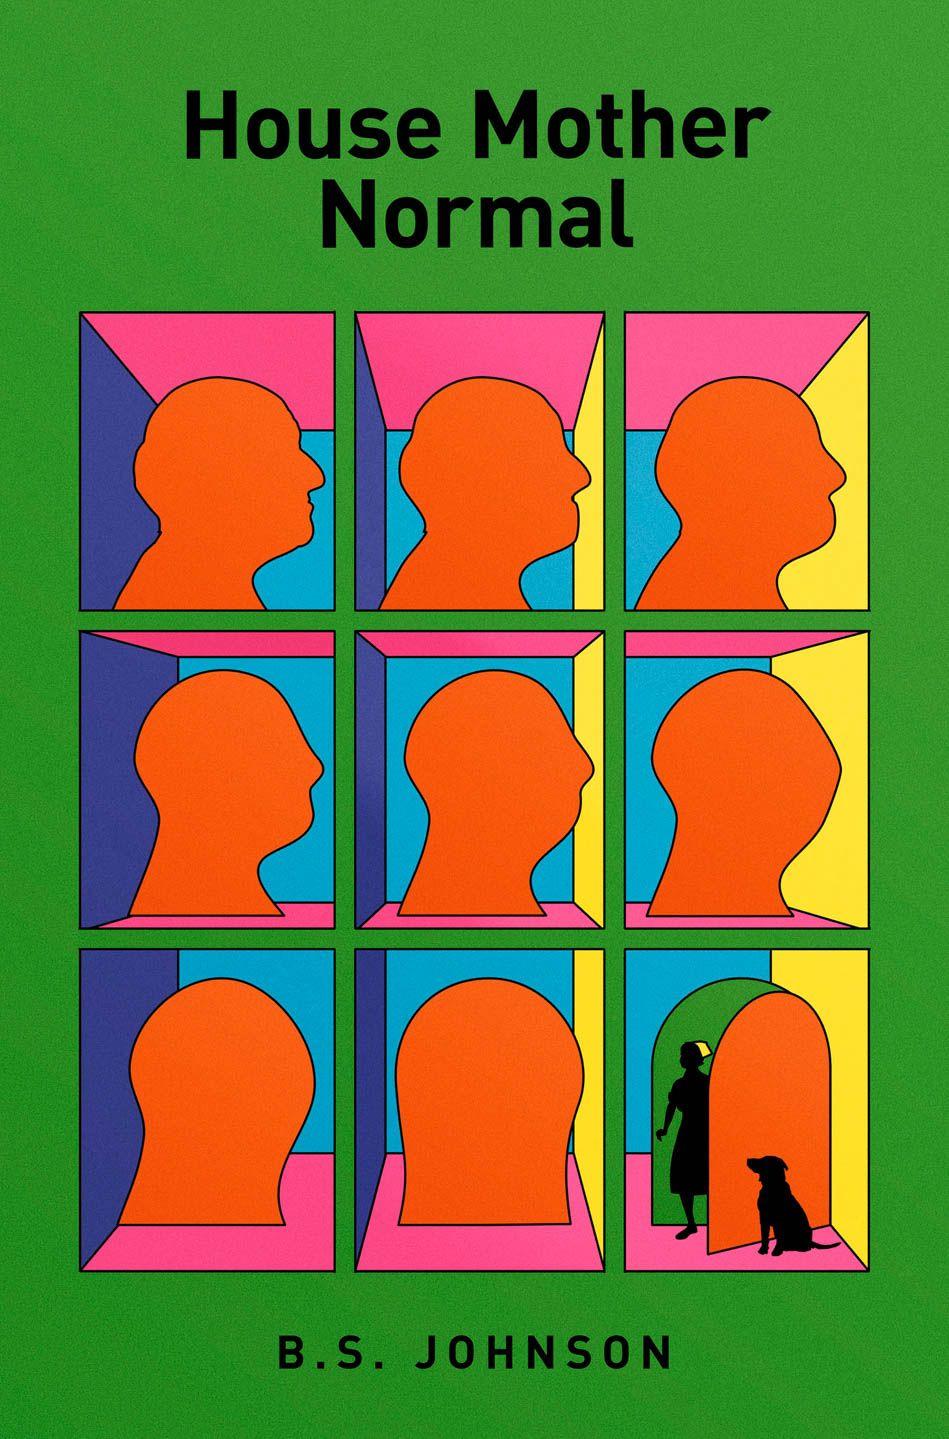 La Boca - Book Covers